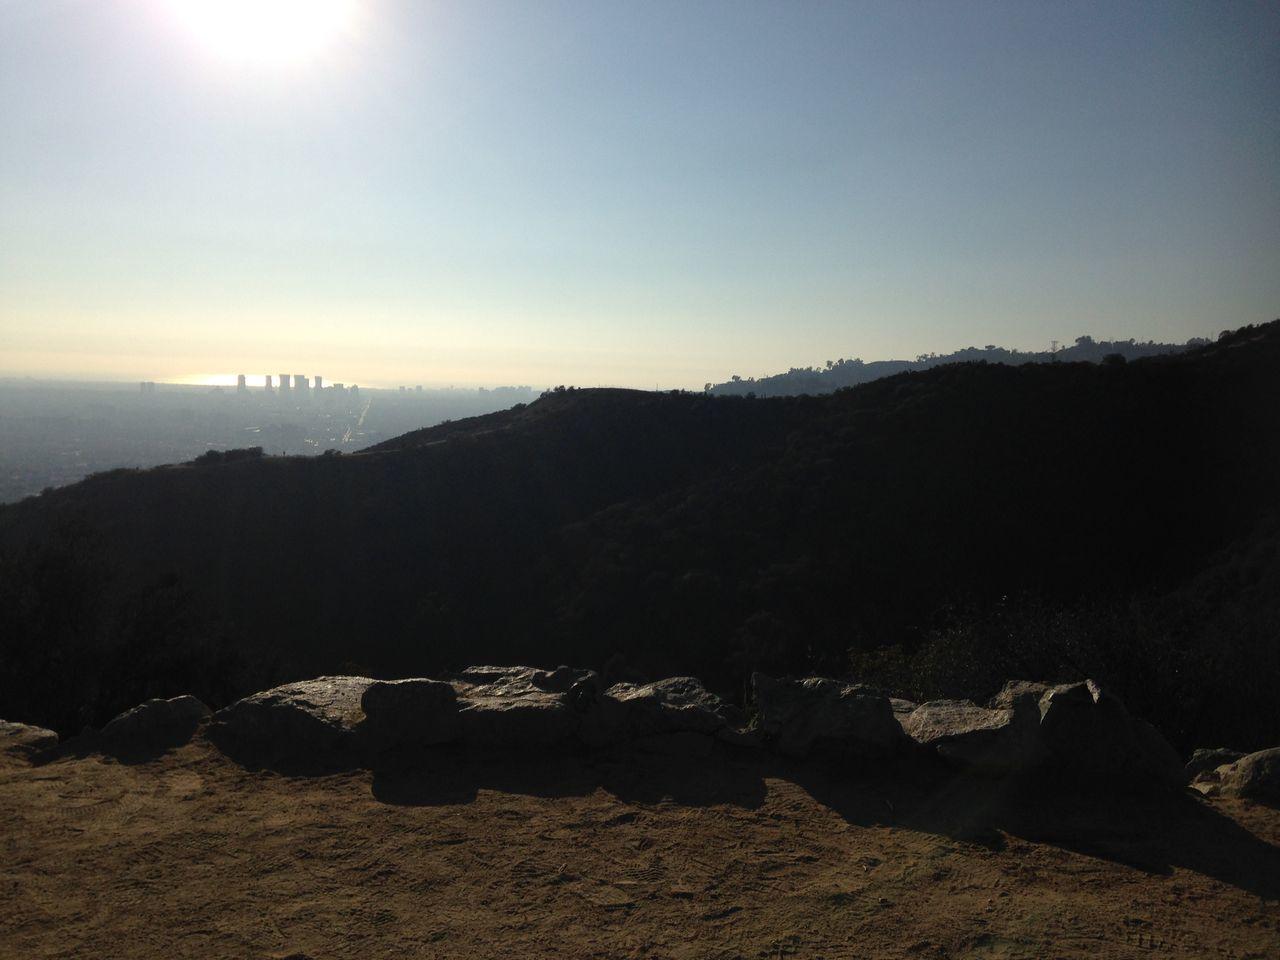 Runyon Canyon Los Angeles, California Hiking Mountain